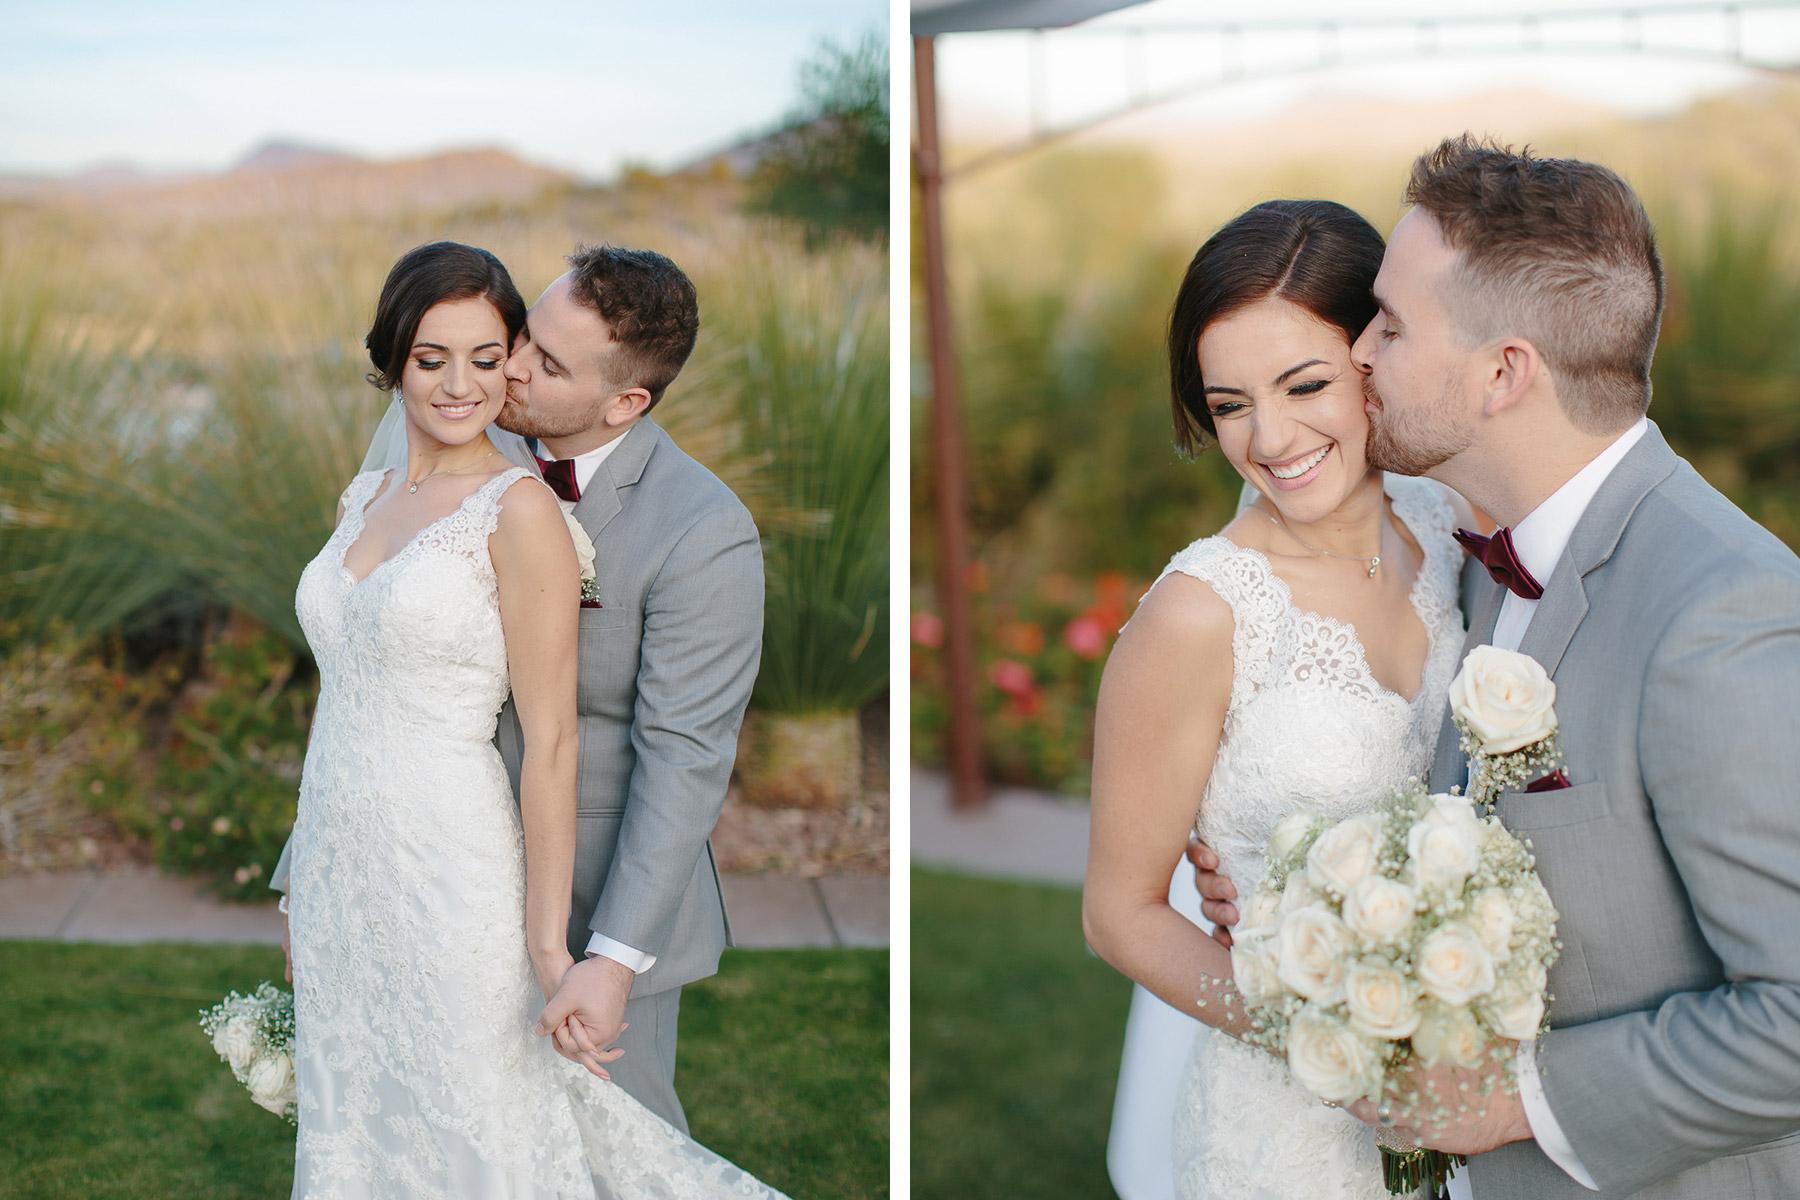 161210-Luxium-Weddings-Arizona-Matt-Jenny-Anthem-Golf-Country-Club-1047a.jpg